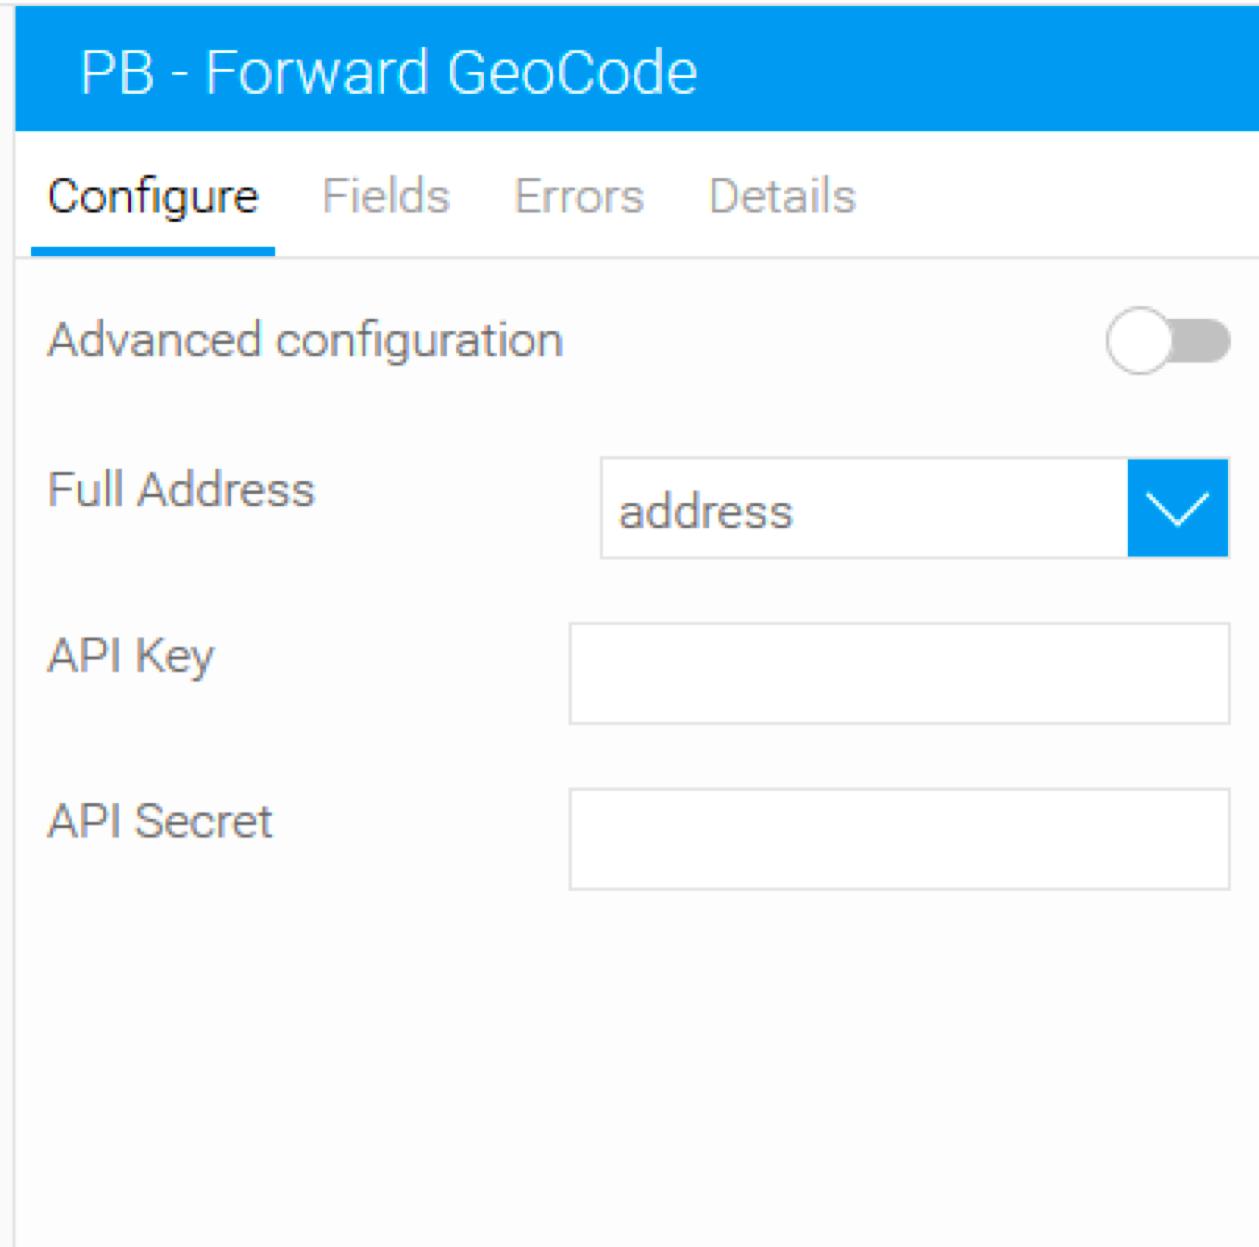 Pitney Bowes forward geocode in Yellowfin - single line address input